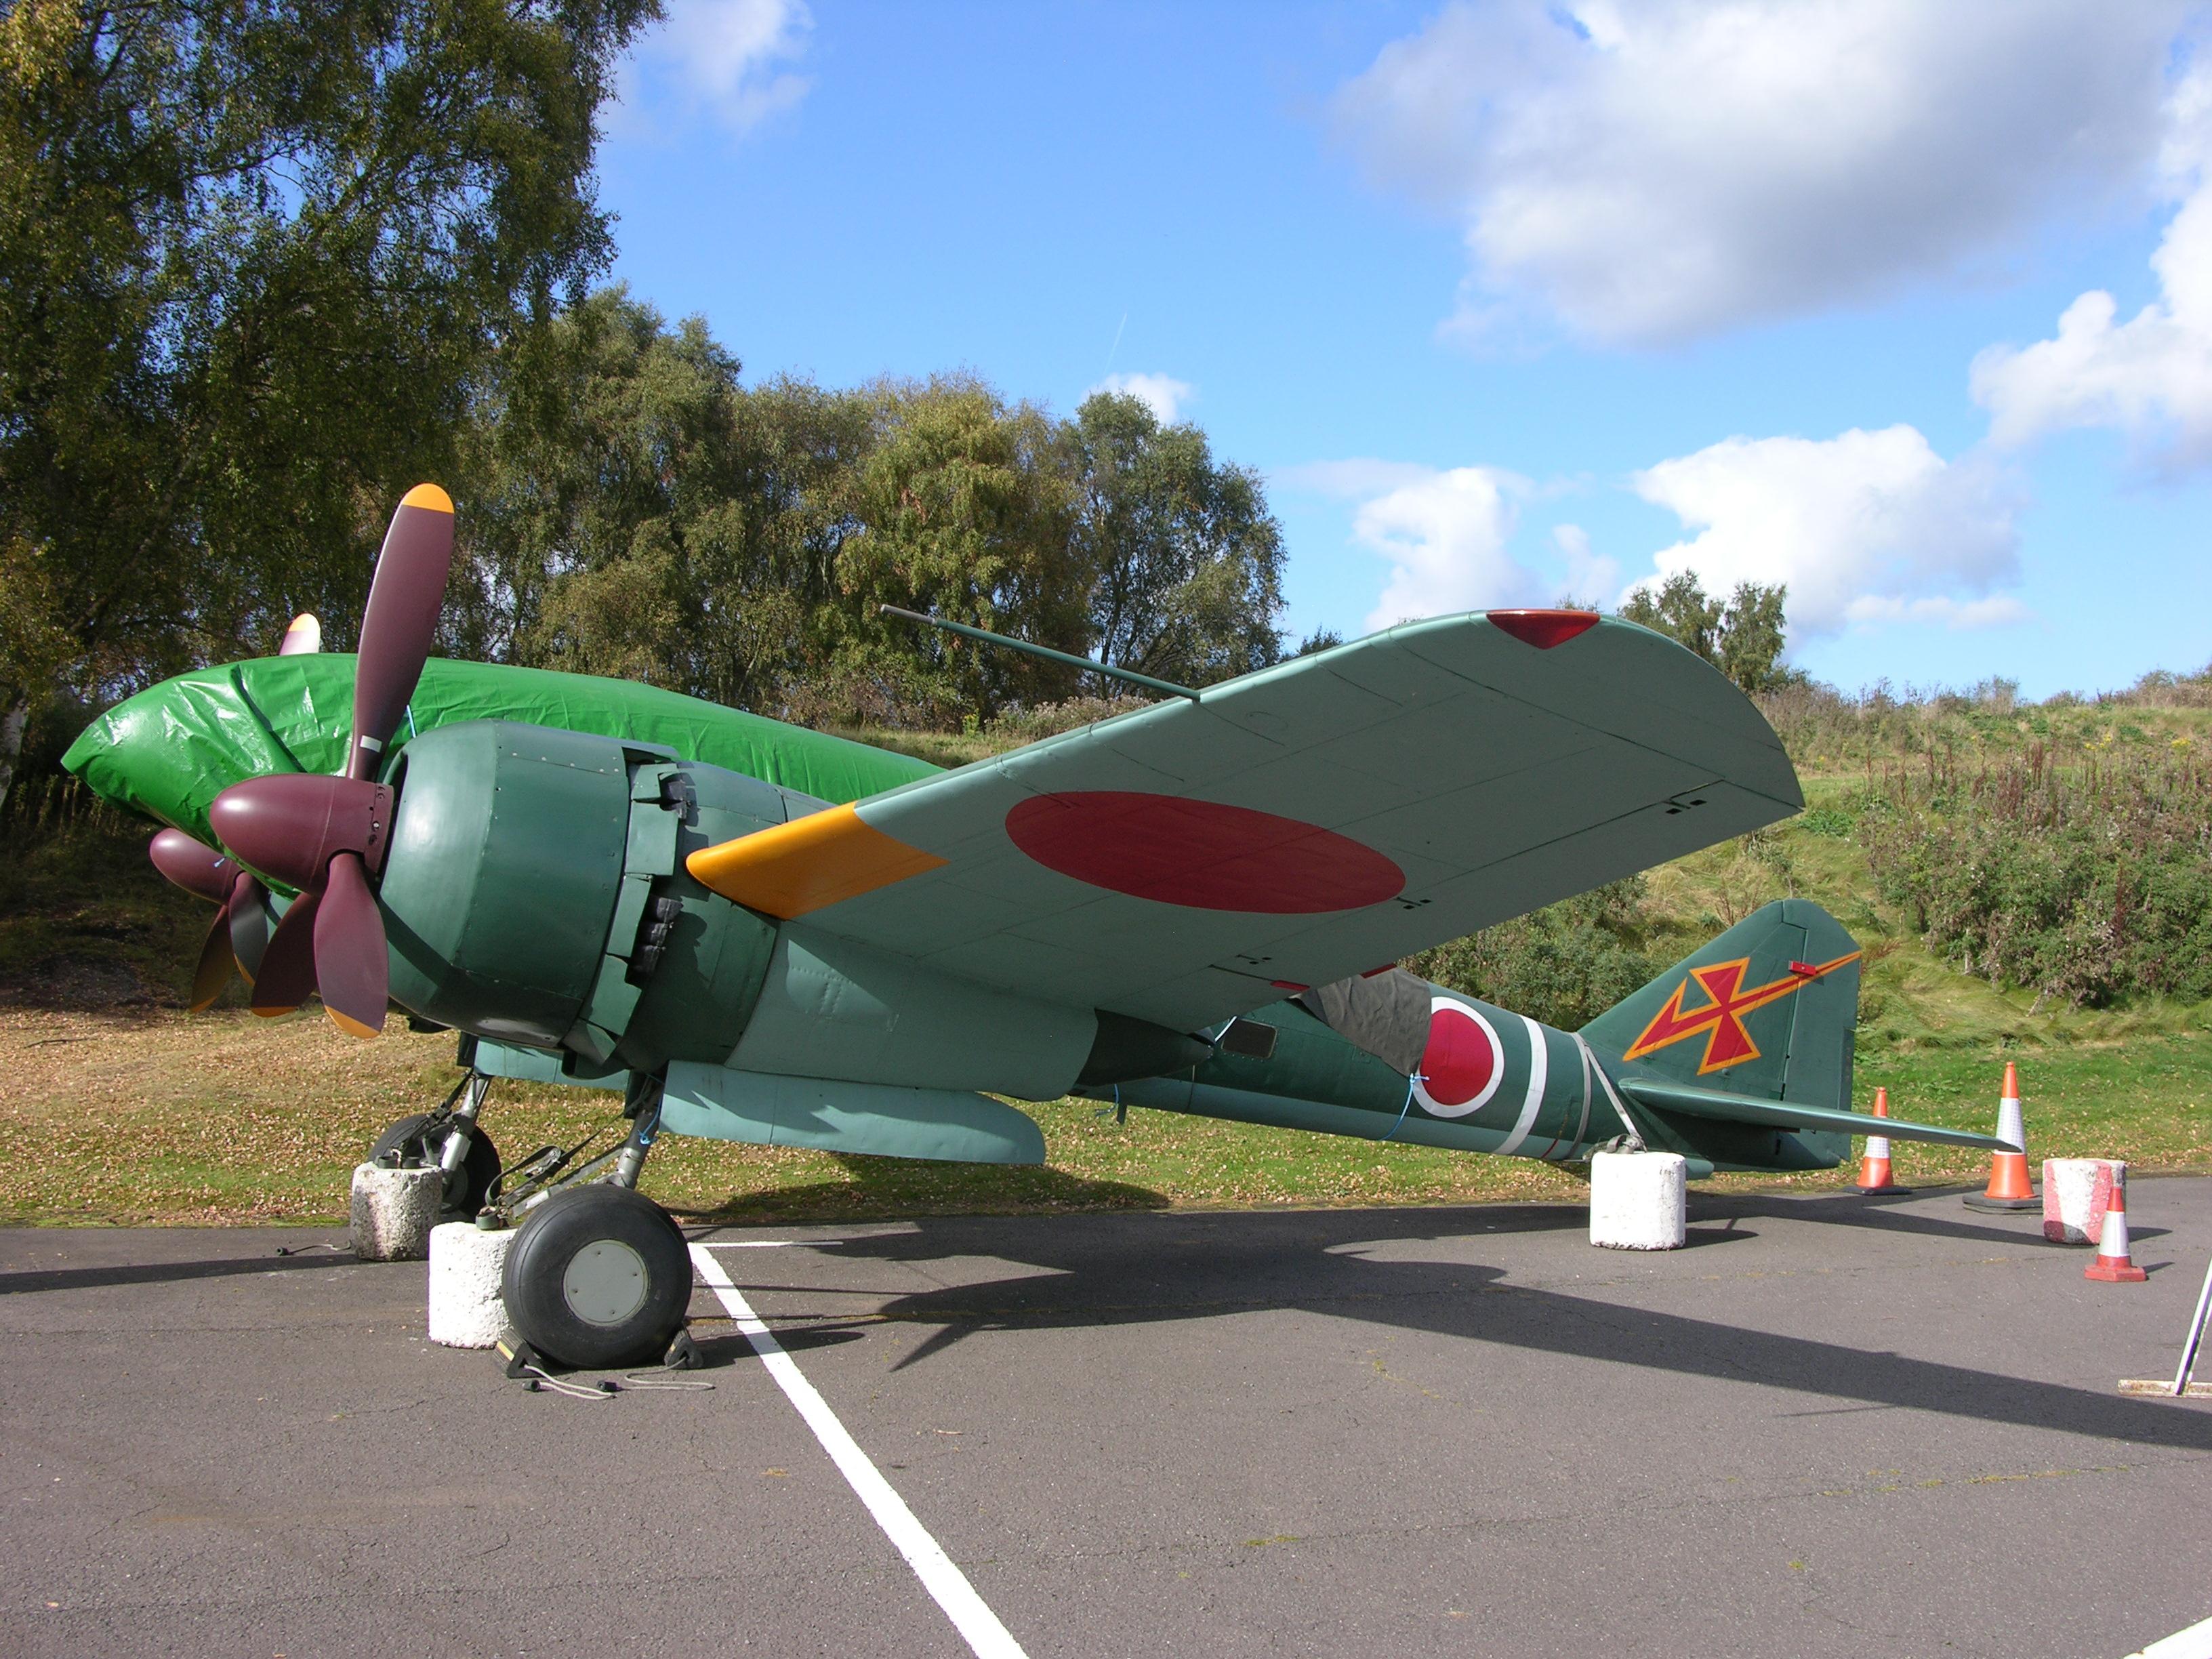 File:Mitsubishi Ki-46 Dinah (4014847858).jpg - Wikimedia Commons